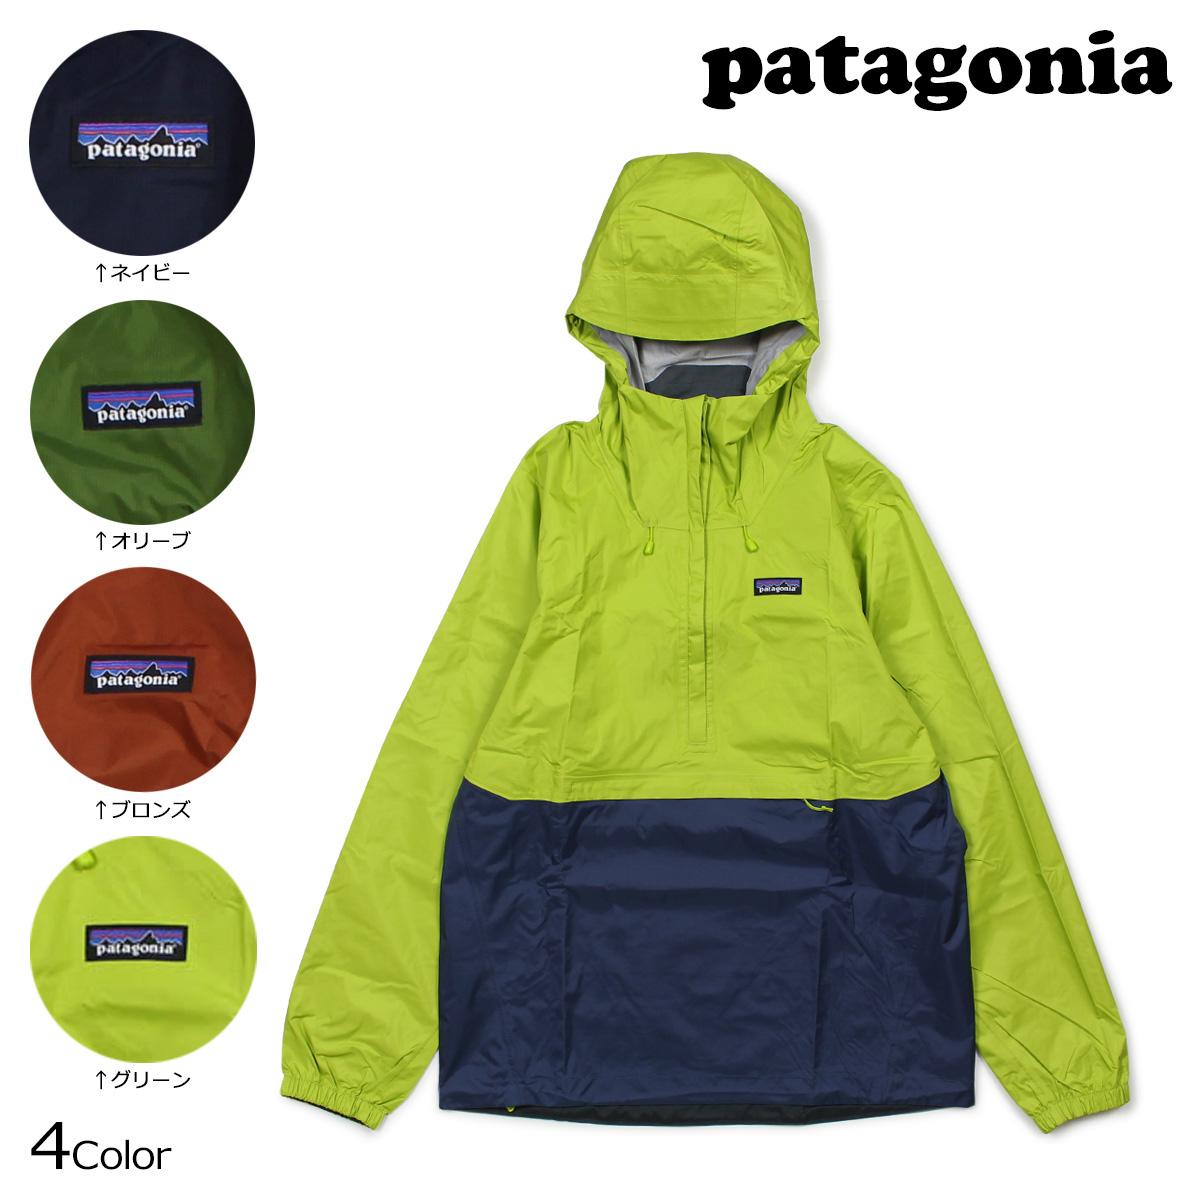 patagonia パタゴニア ジャケット メンズ プルオーバー MENS TORRENTSHELL PULLOVER 83932